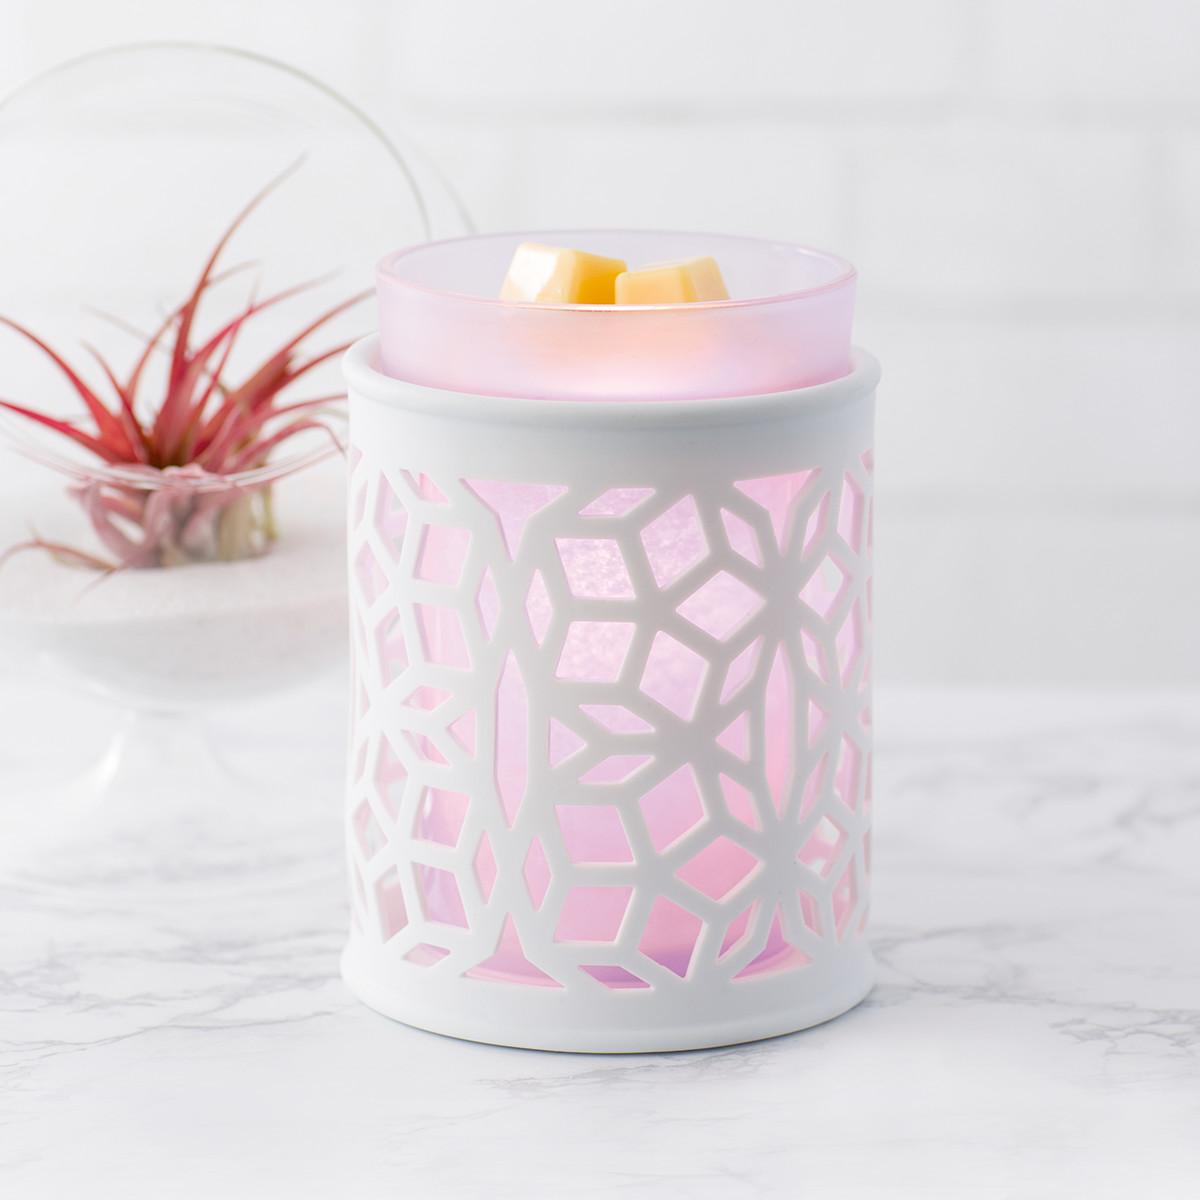 Best Room Designs Darling Purple Insert Scentsy Warmer Scentsy 174 Online Store